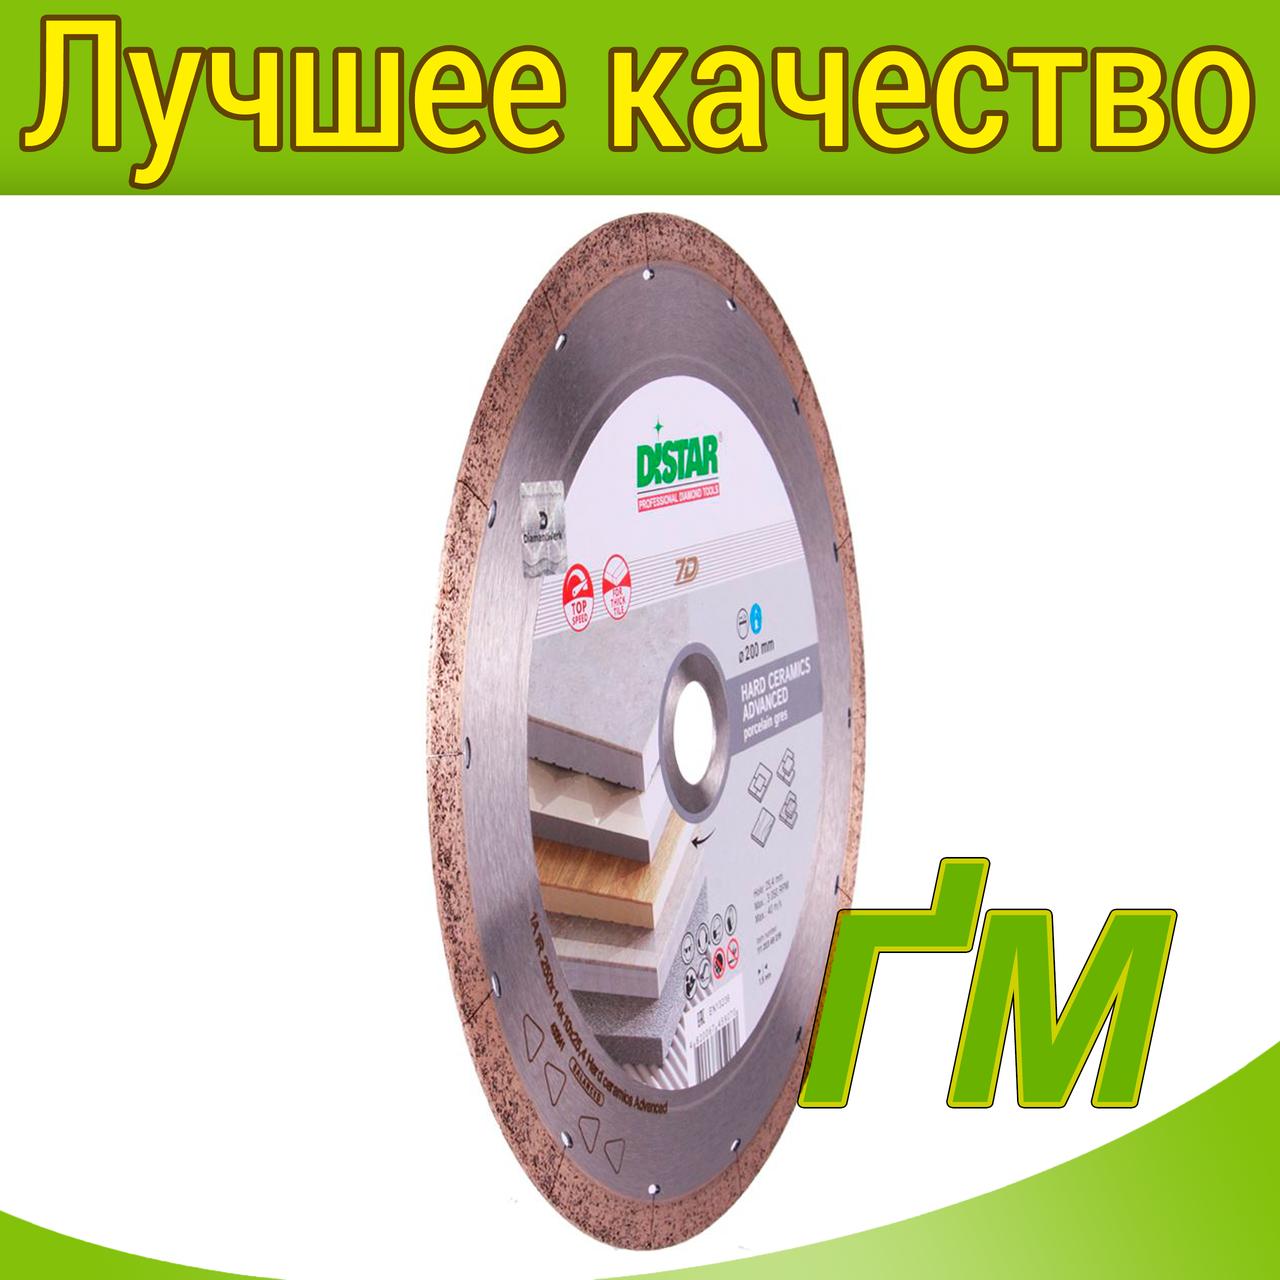 Алмазные диски для станков Hard Ceramics Advanced 1A1R 250x1,5x10x25,4